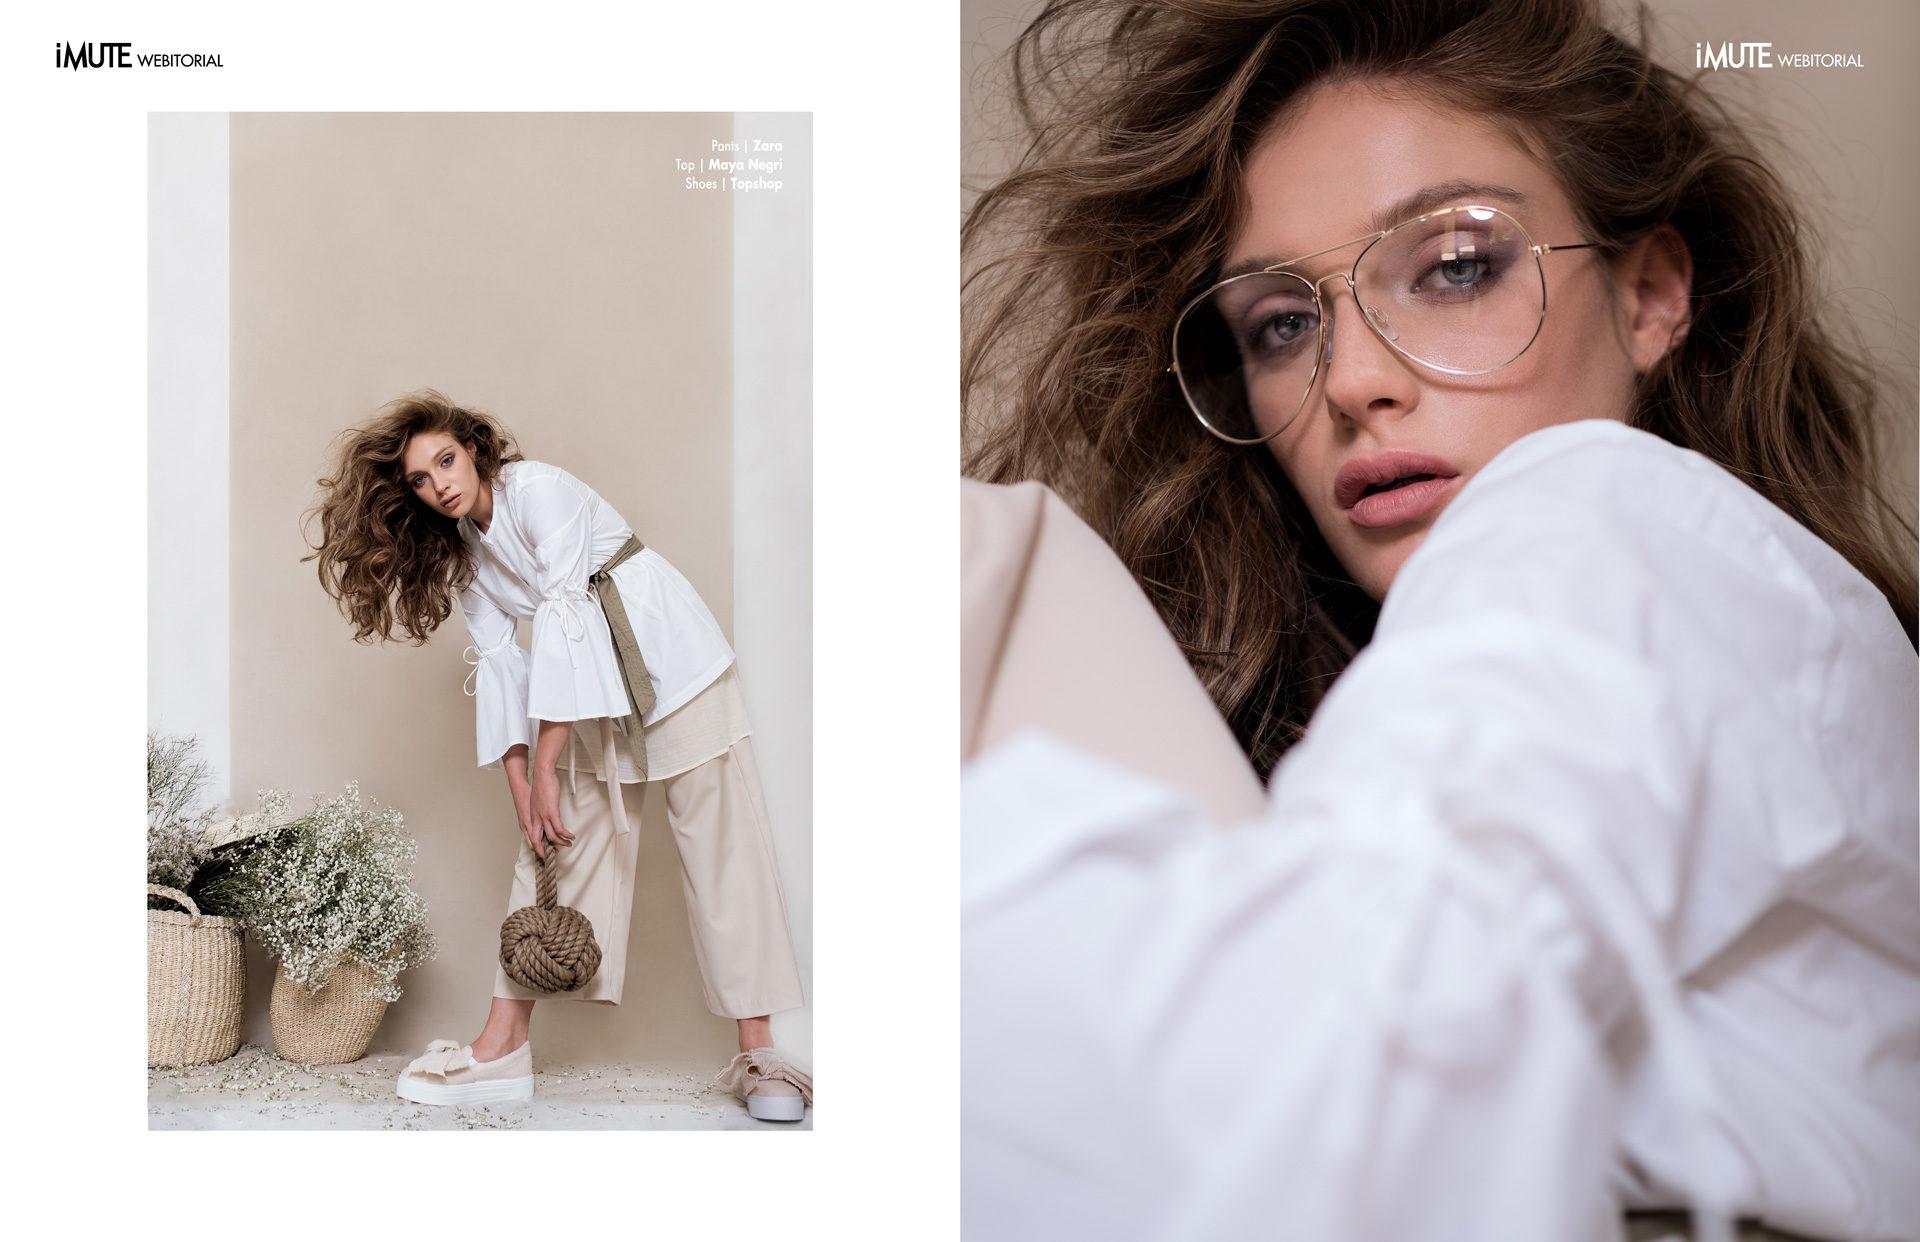 Romi webitorial for iMute Magazine Photographer|Tal Brushel Model| Romi Pavoncello @ITM Models Israel Stylist|Anna Karpunov Makeup & Hair|Gitla Brushel